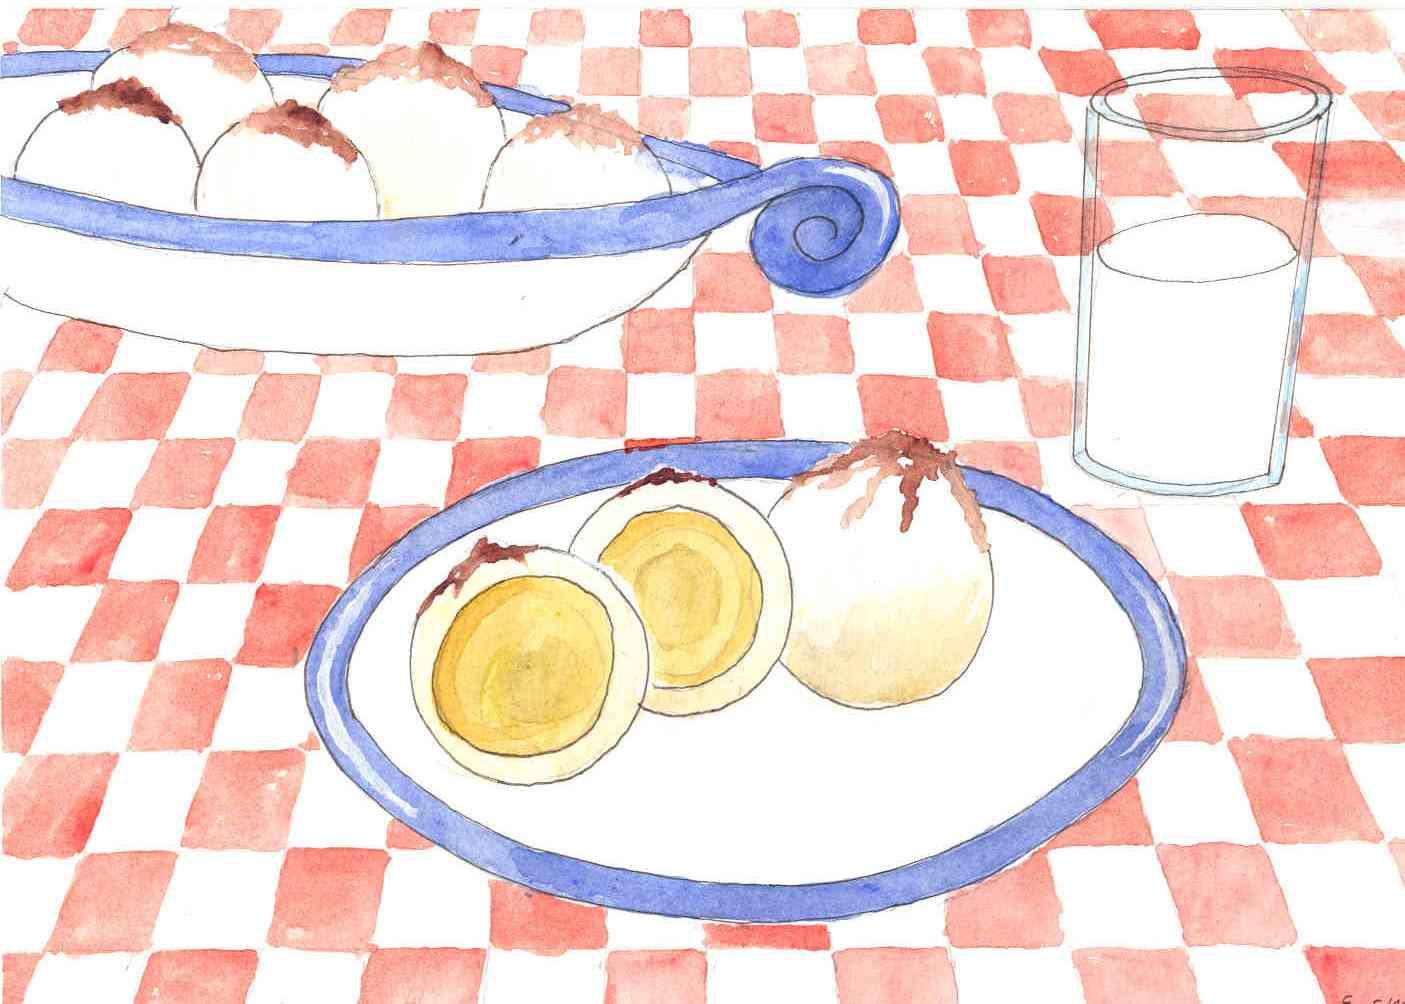 Handgemalte Illustration marillenknoedel